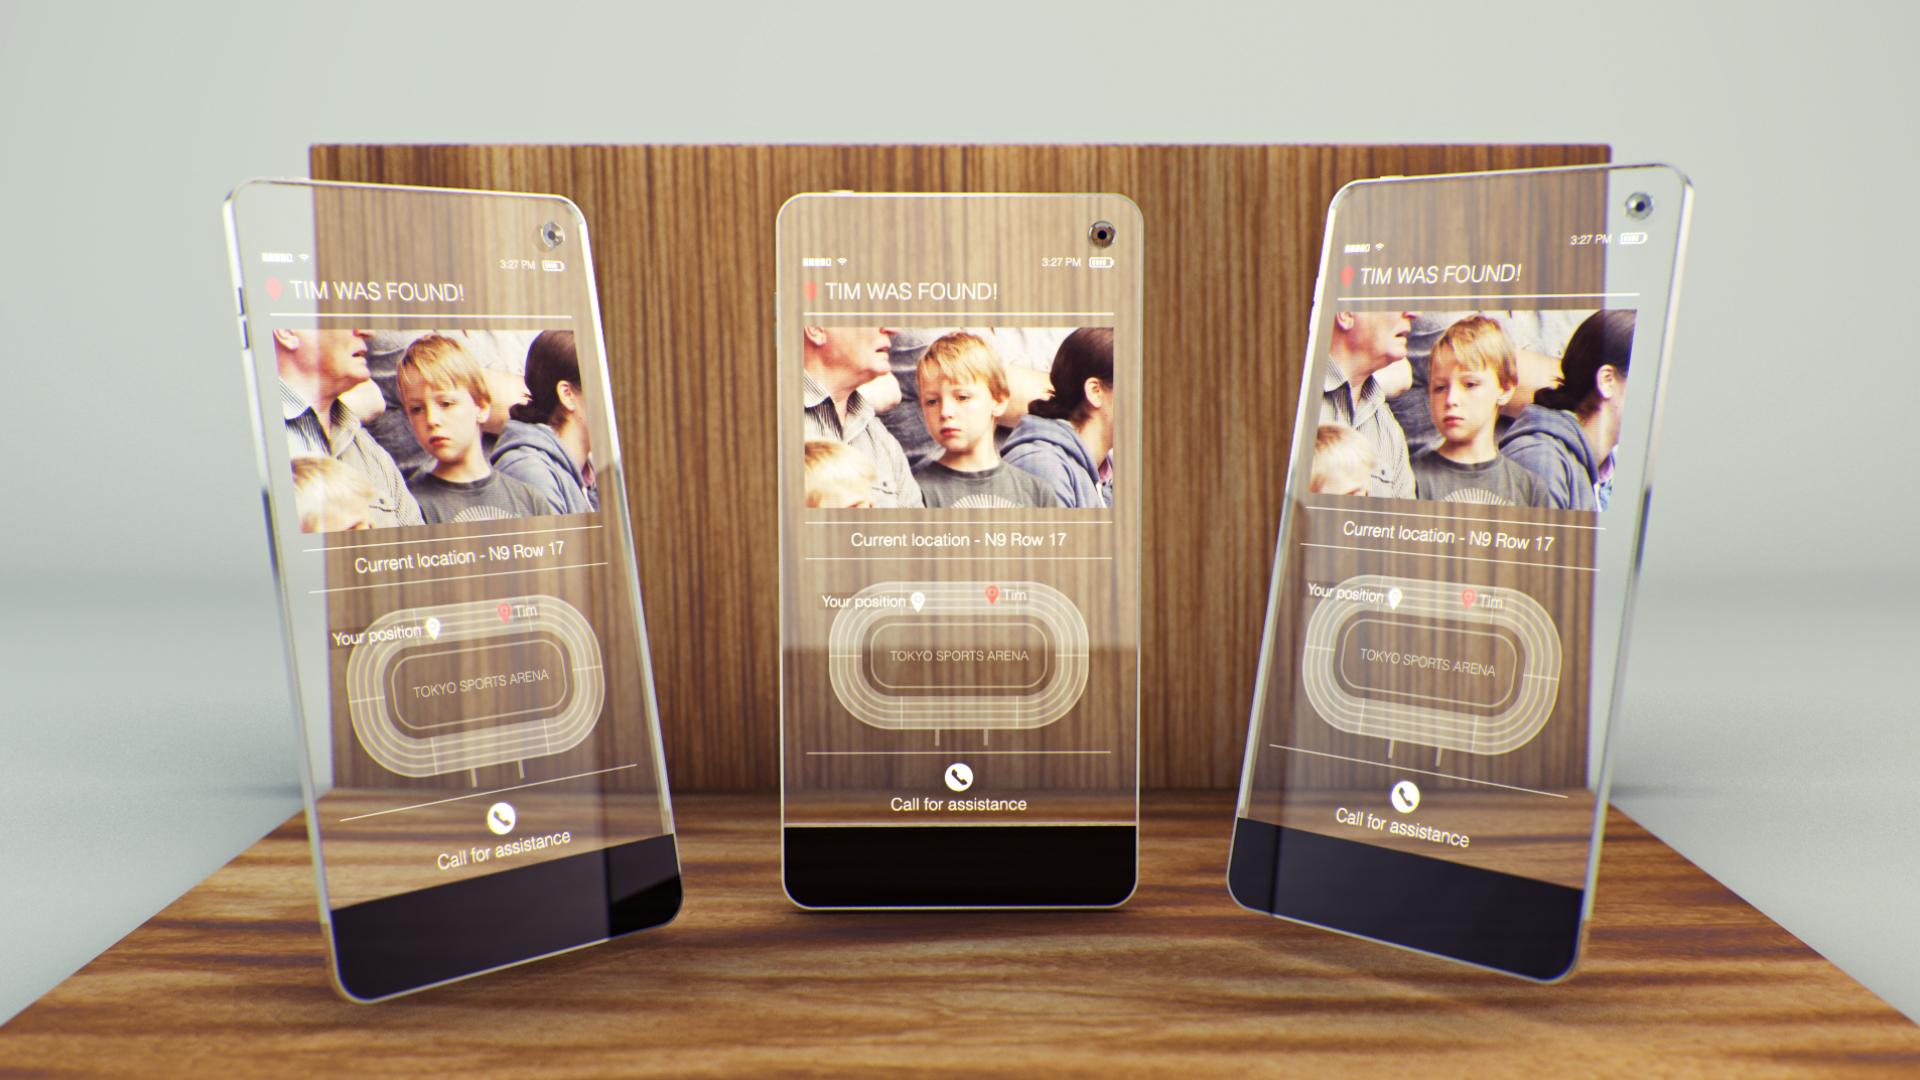 140917_Phone_Device_01 wood.jpg